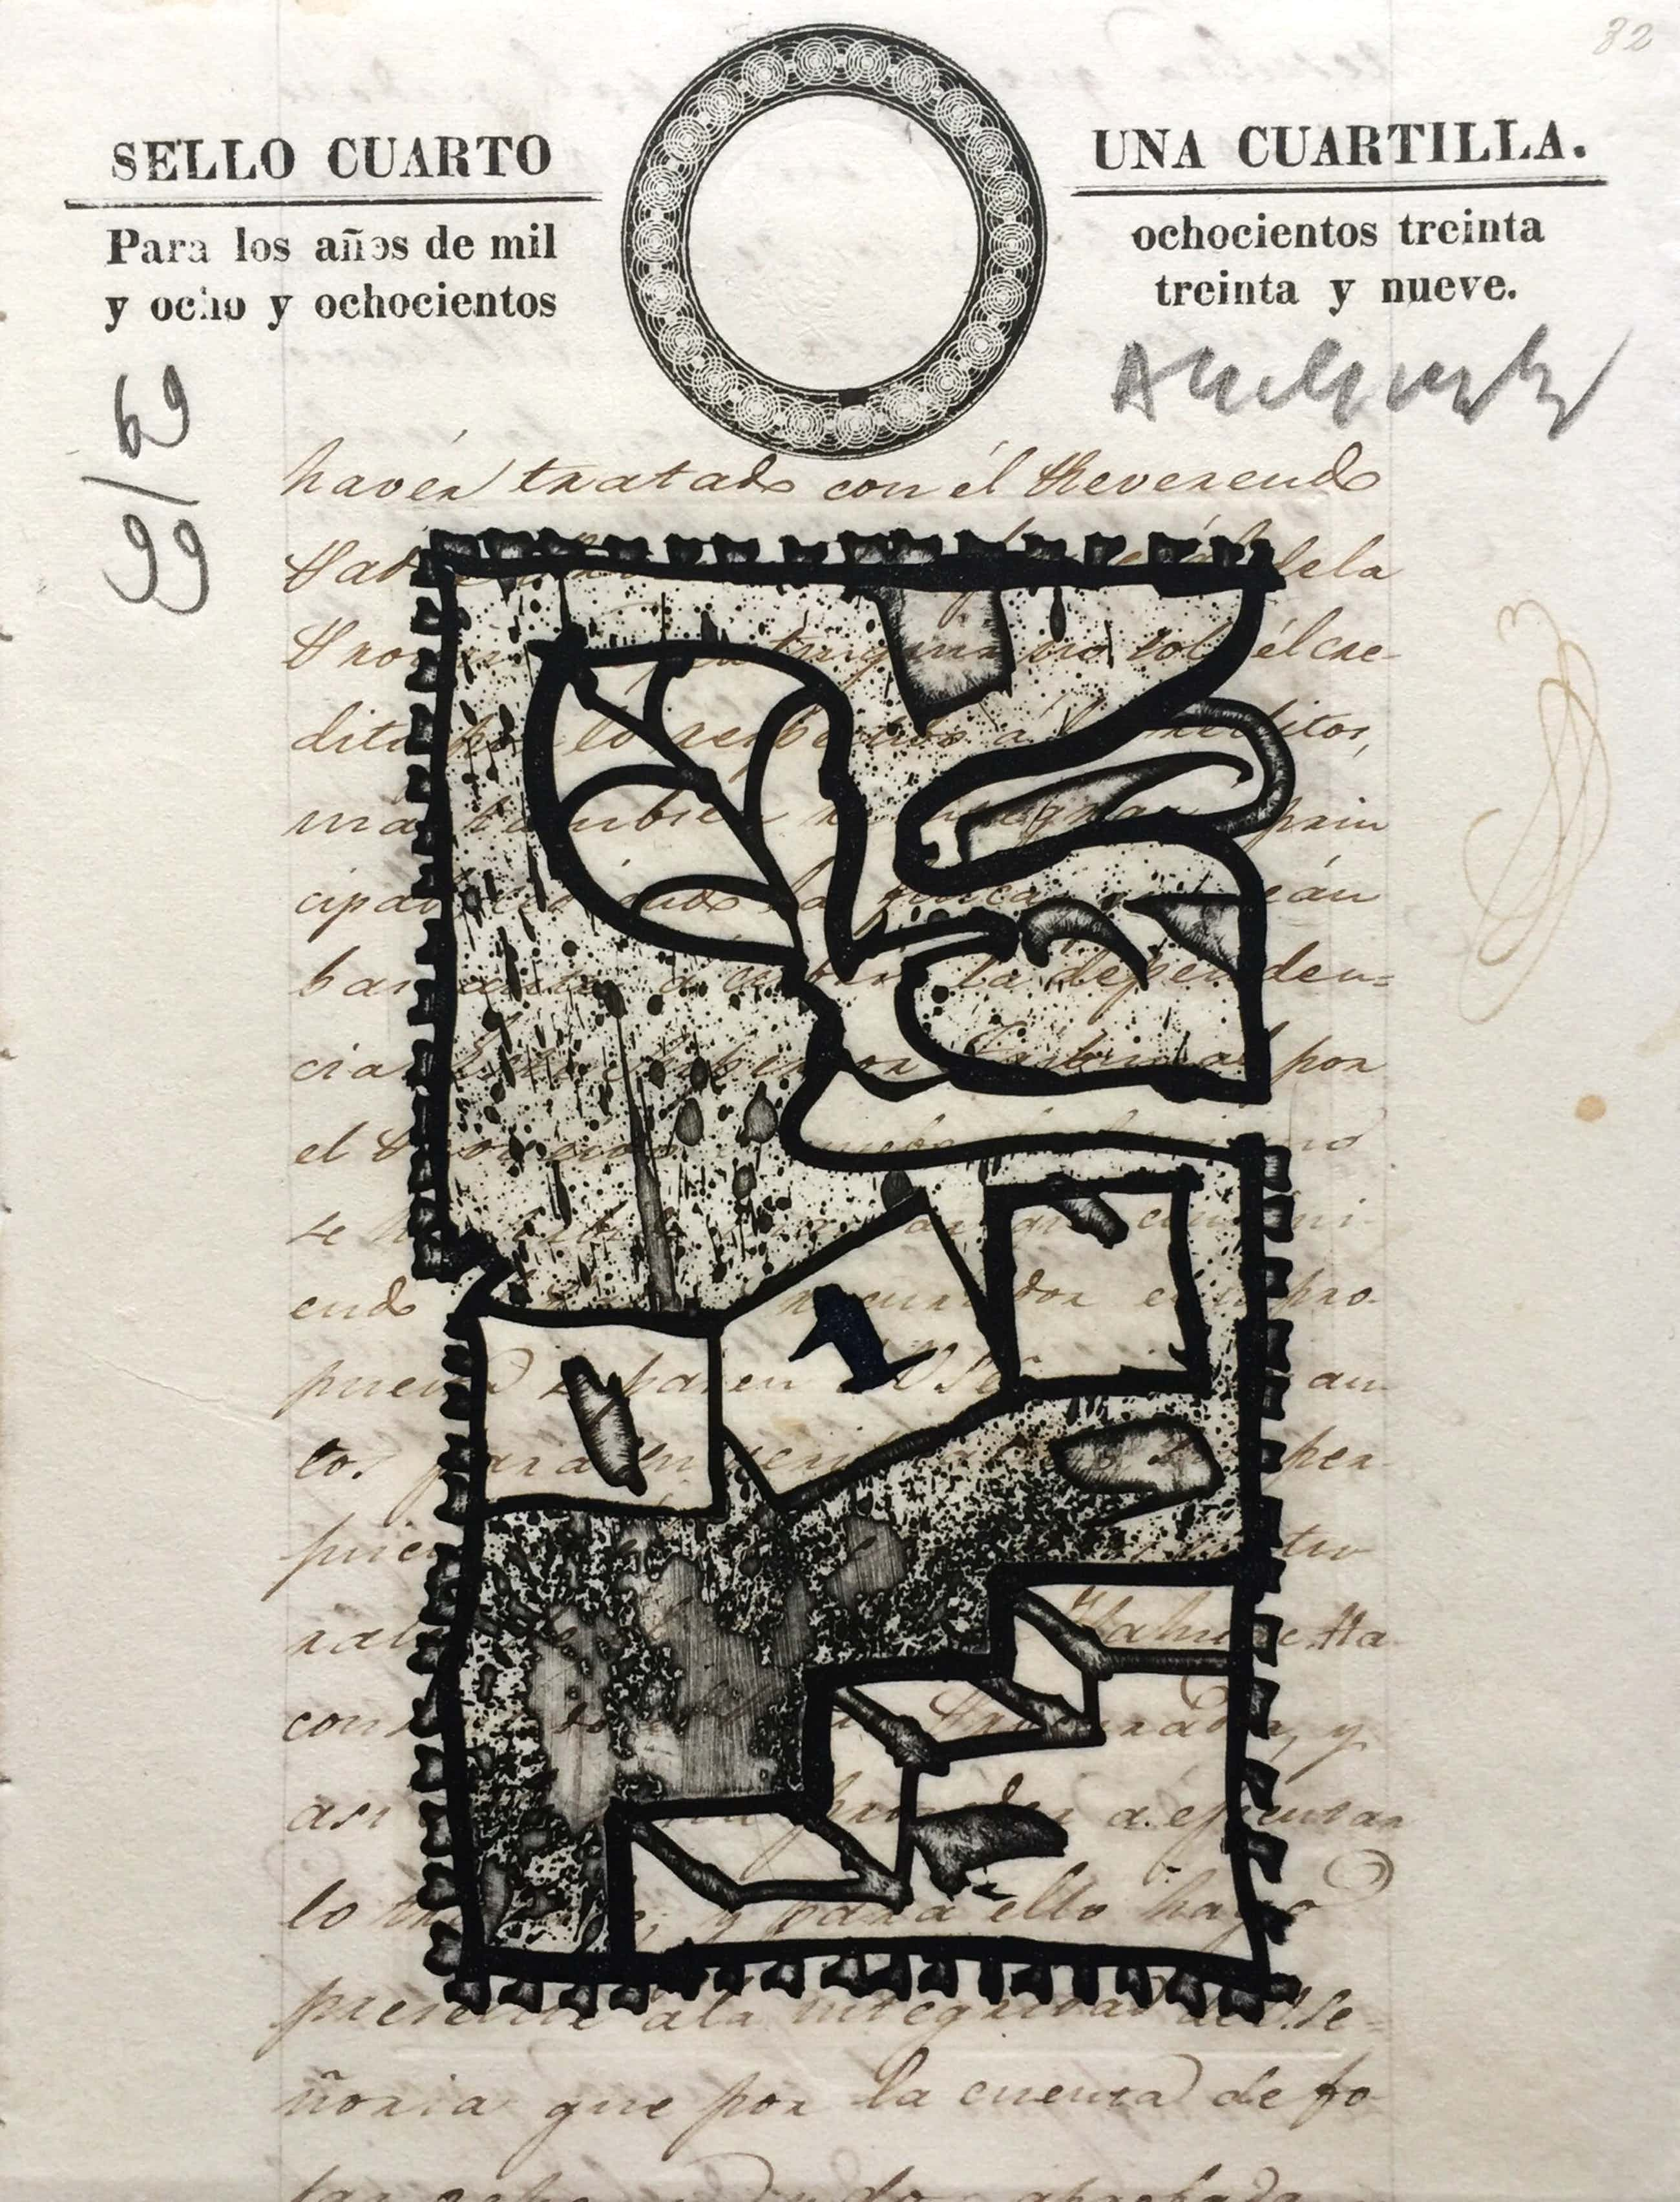 Pierre Alechinsky - Una Cuartilla - ets/aquatint 1993 - oplage 99 kopen? Bied vanaf 500!